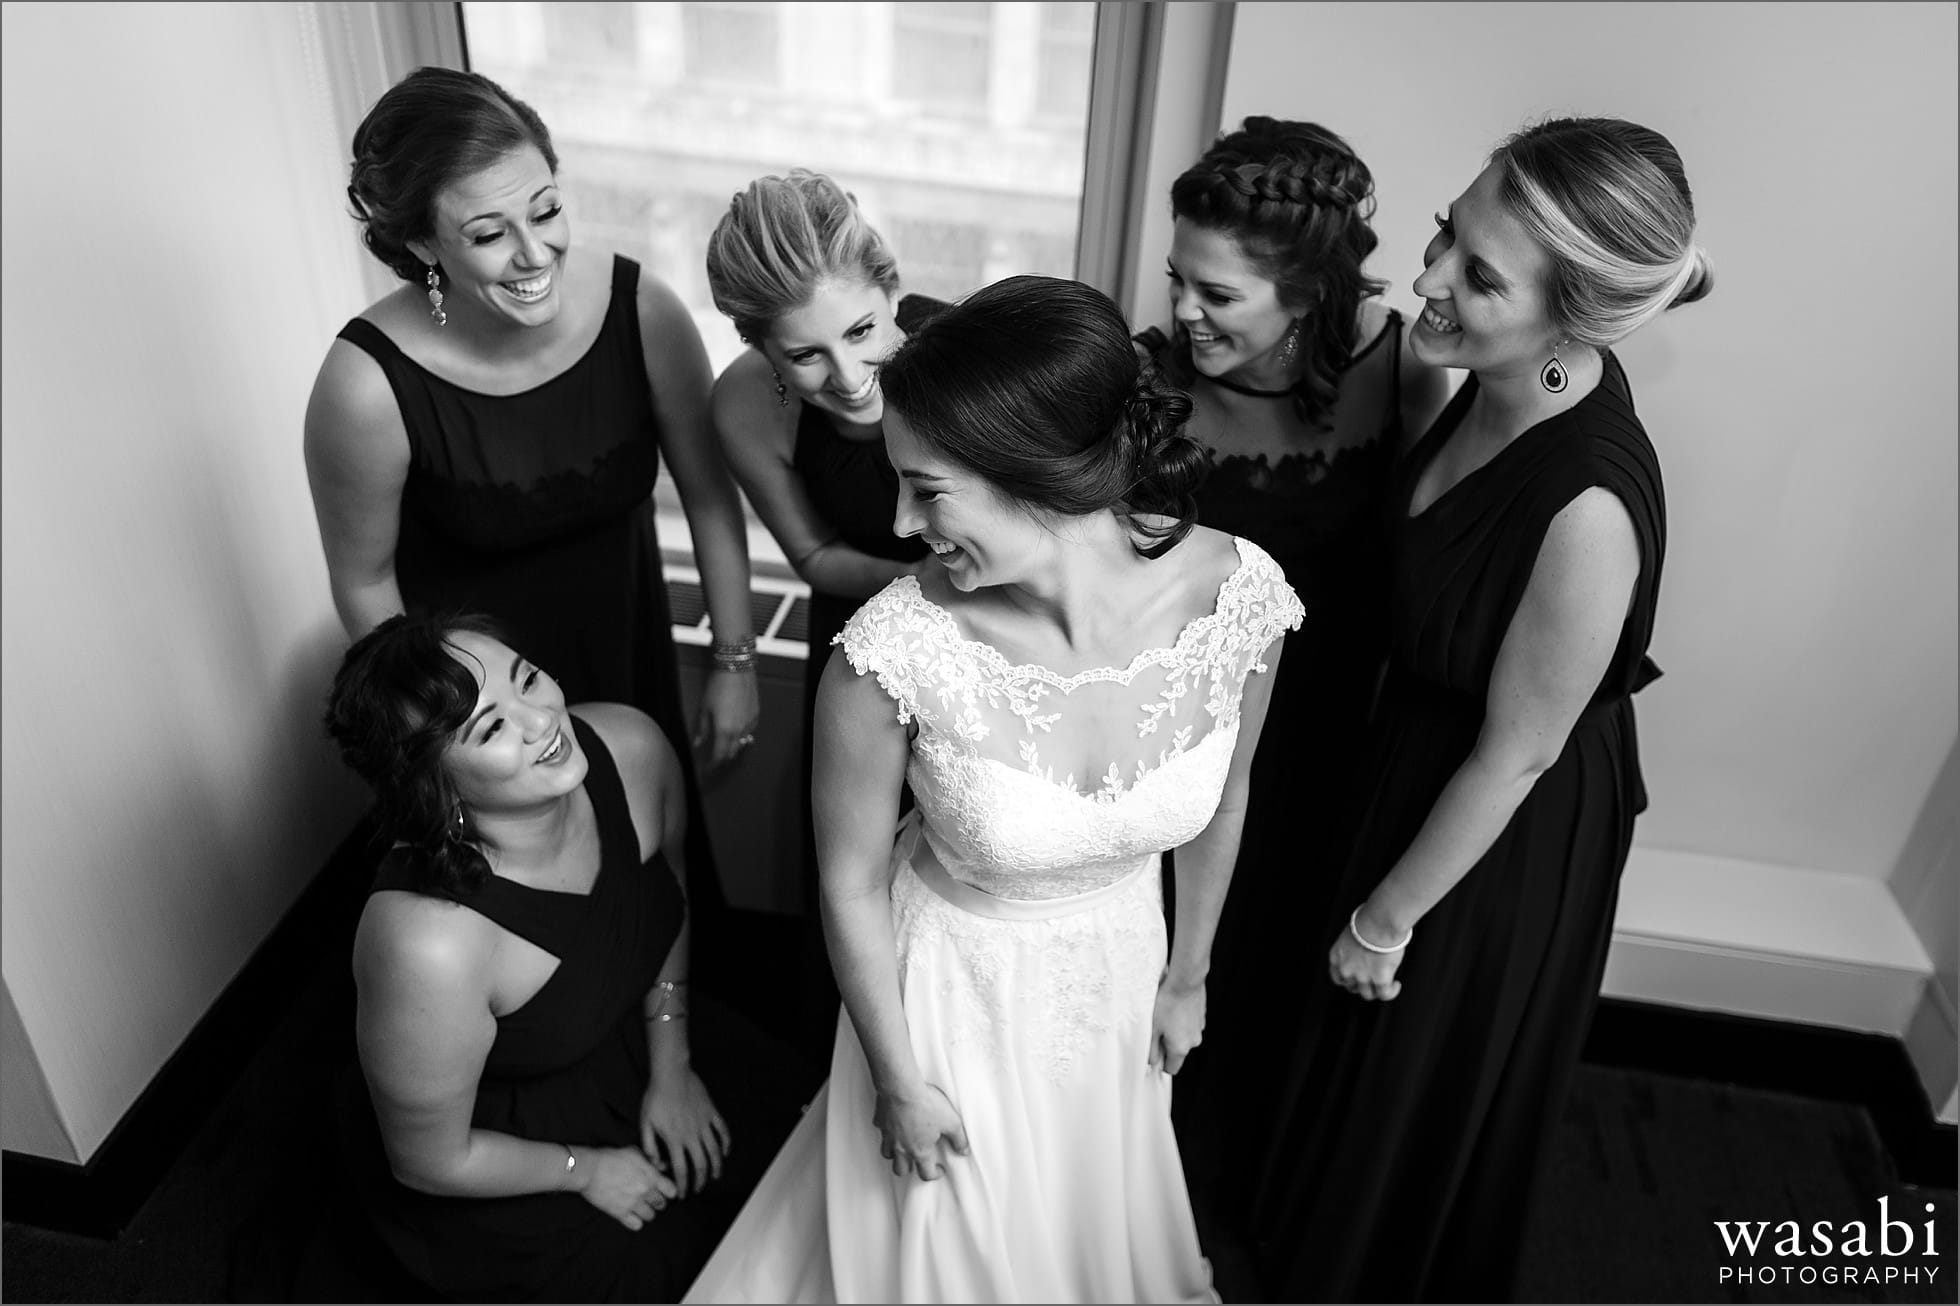 bridesmaids helping bride put on dress w hotel